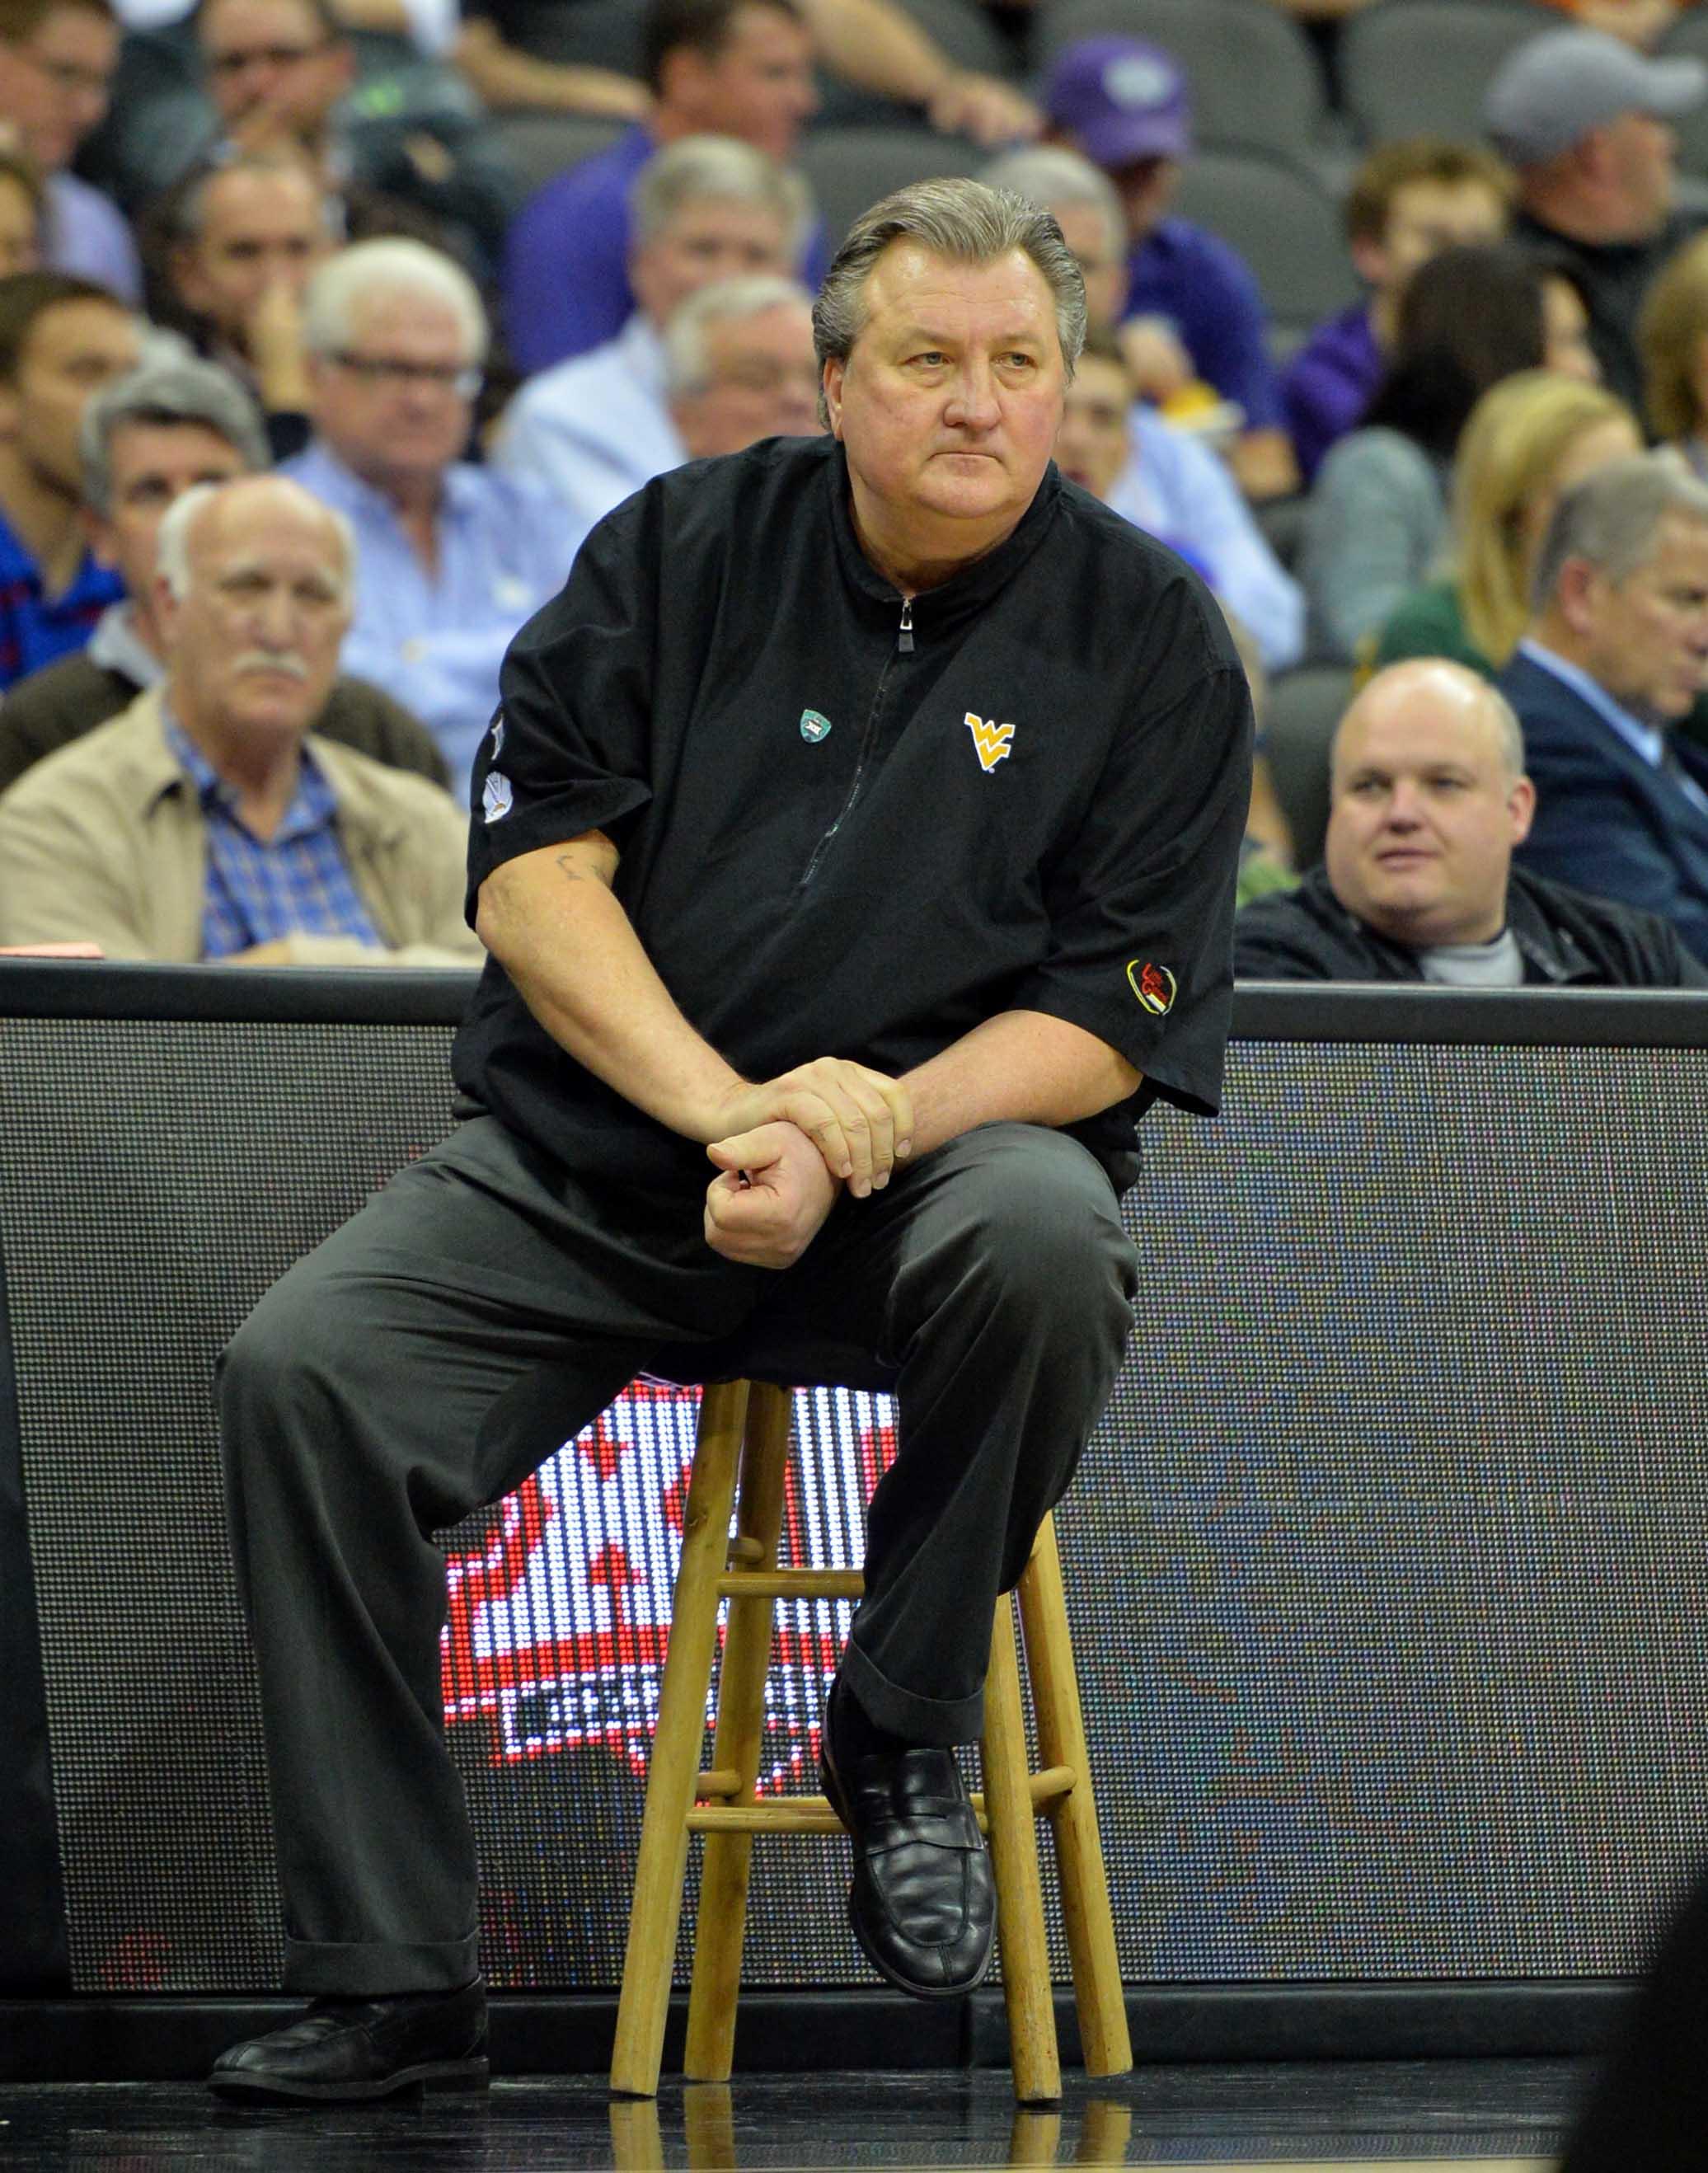 9928756-ncaa-basketball-big-12-championship-west-virginia-vs-texas